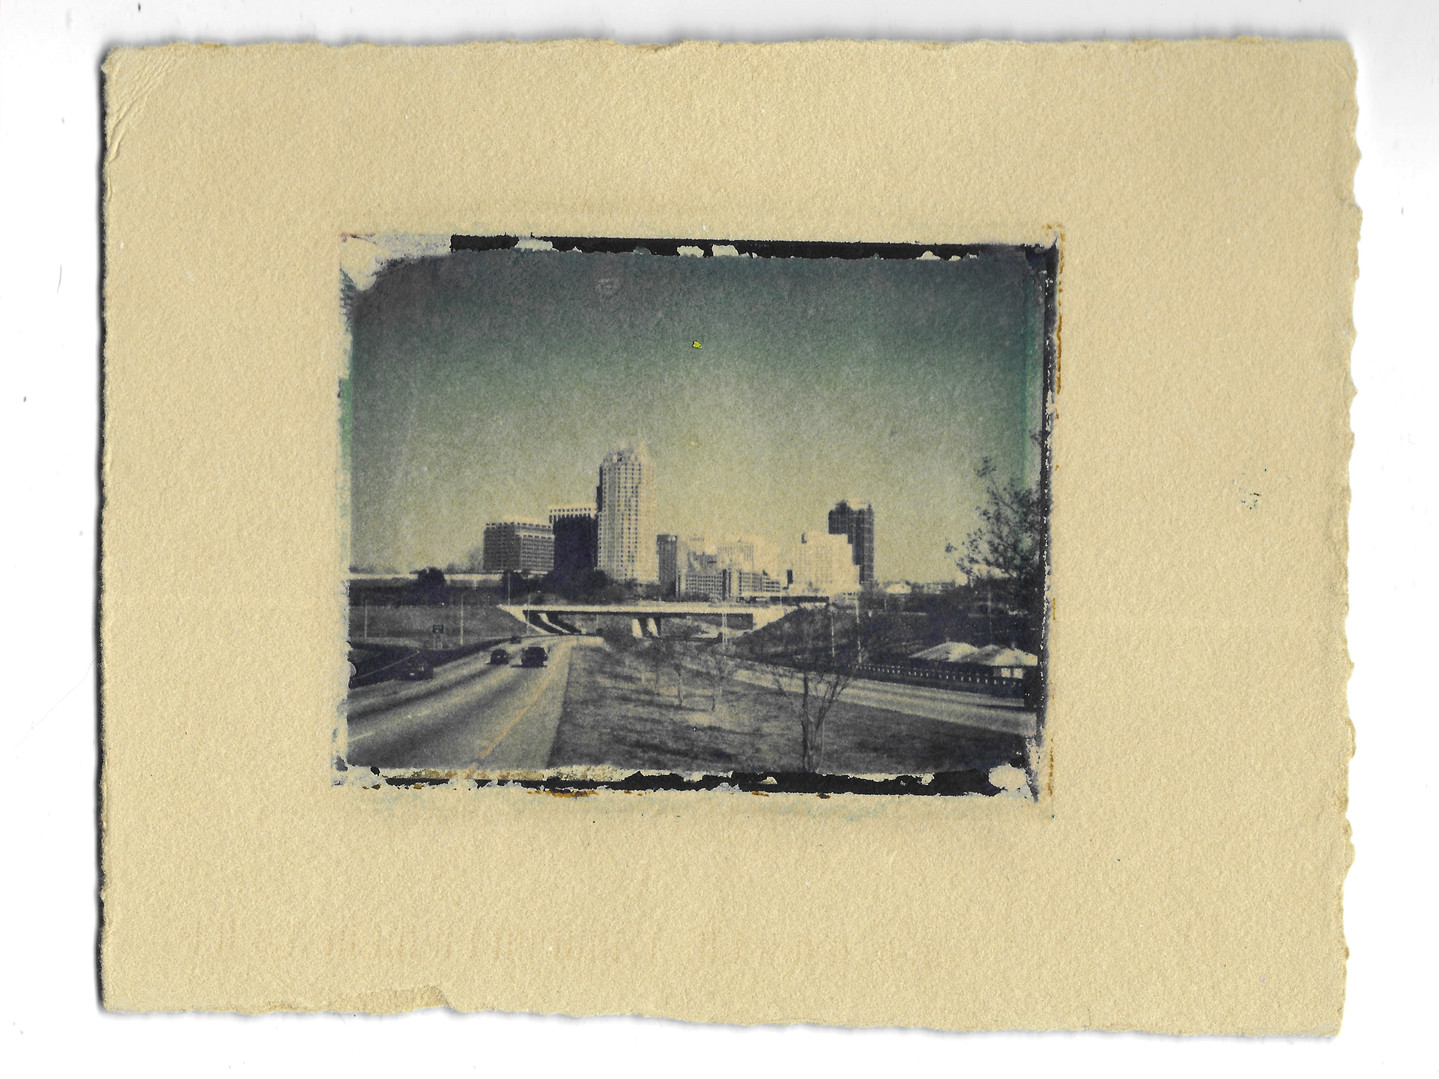 Raleigh Skyline Mid March 1998 - 4pm, Lori Langdon